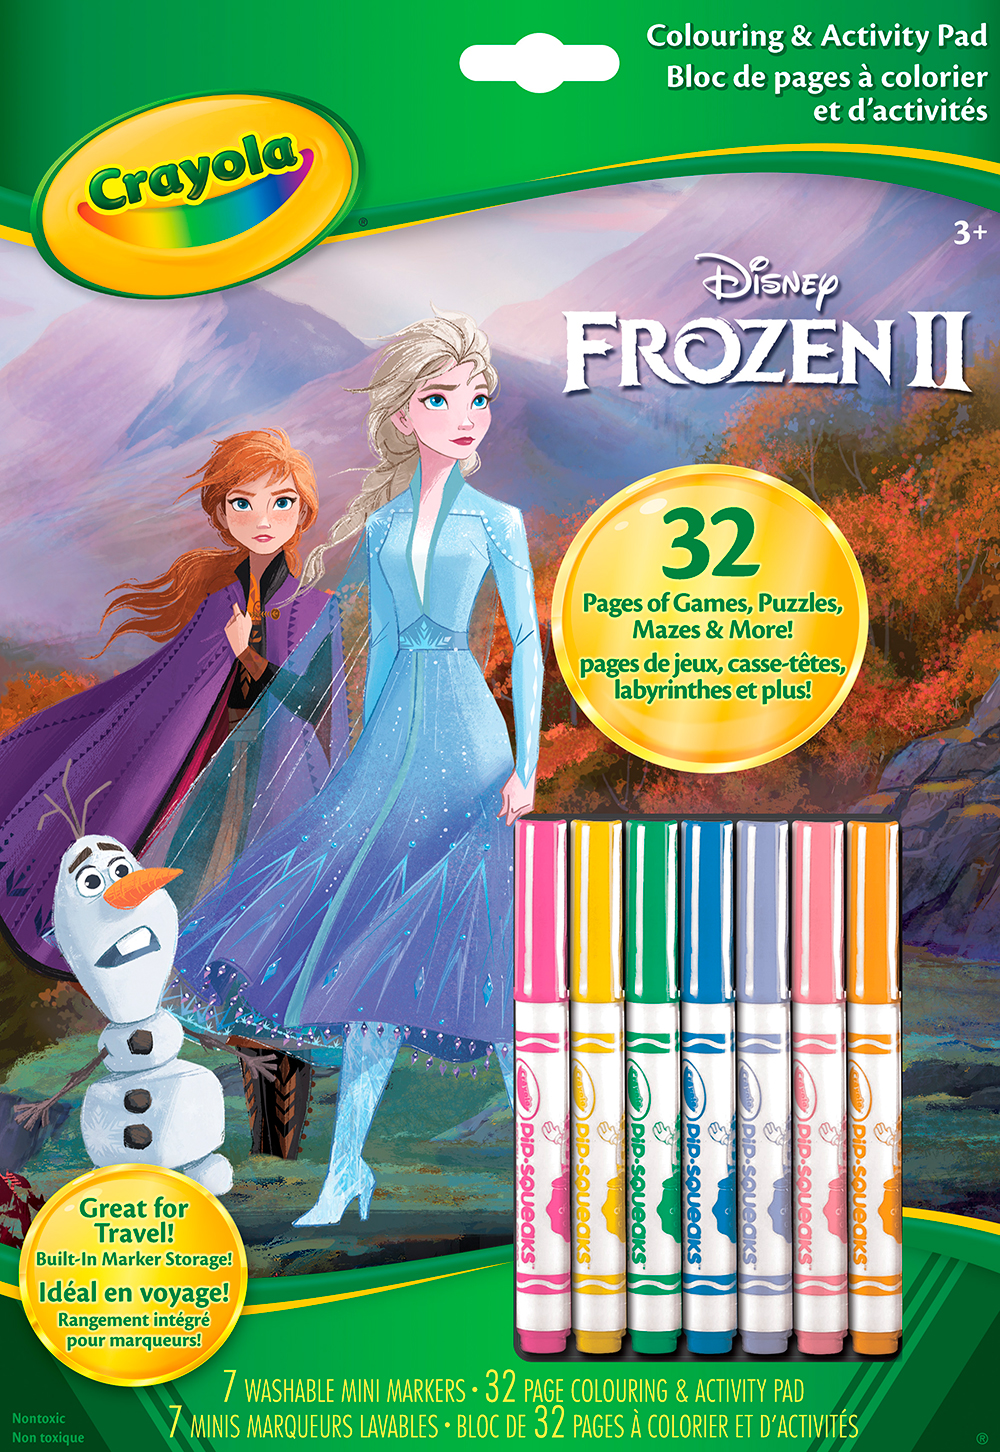 Frozen 2 - Colouring & Activity Pad